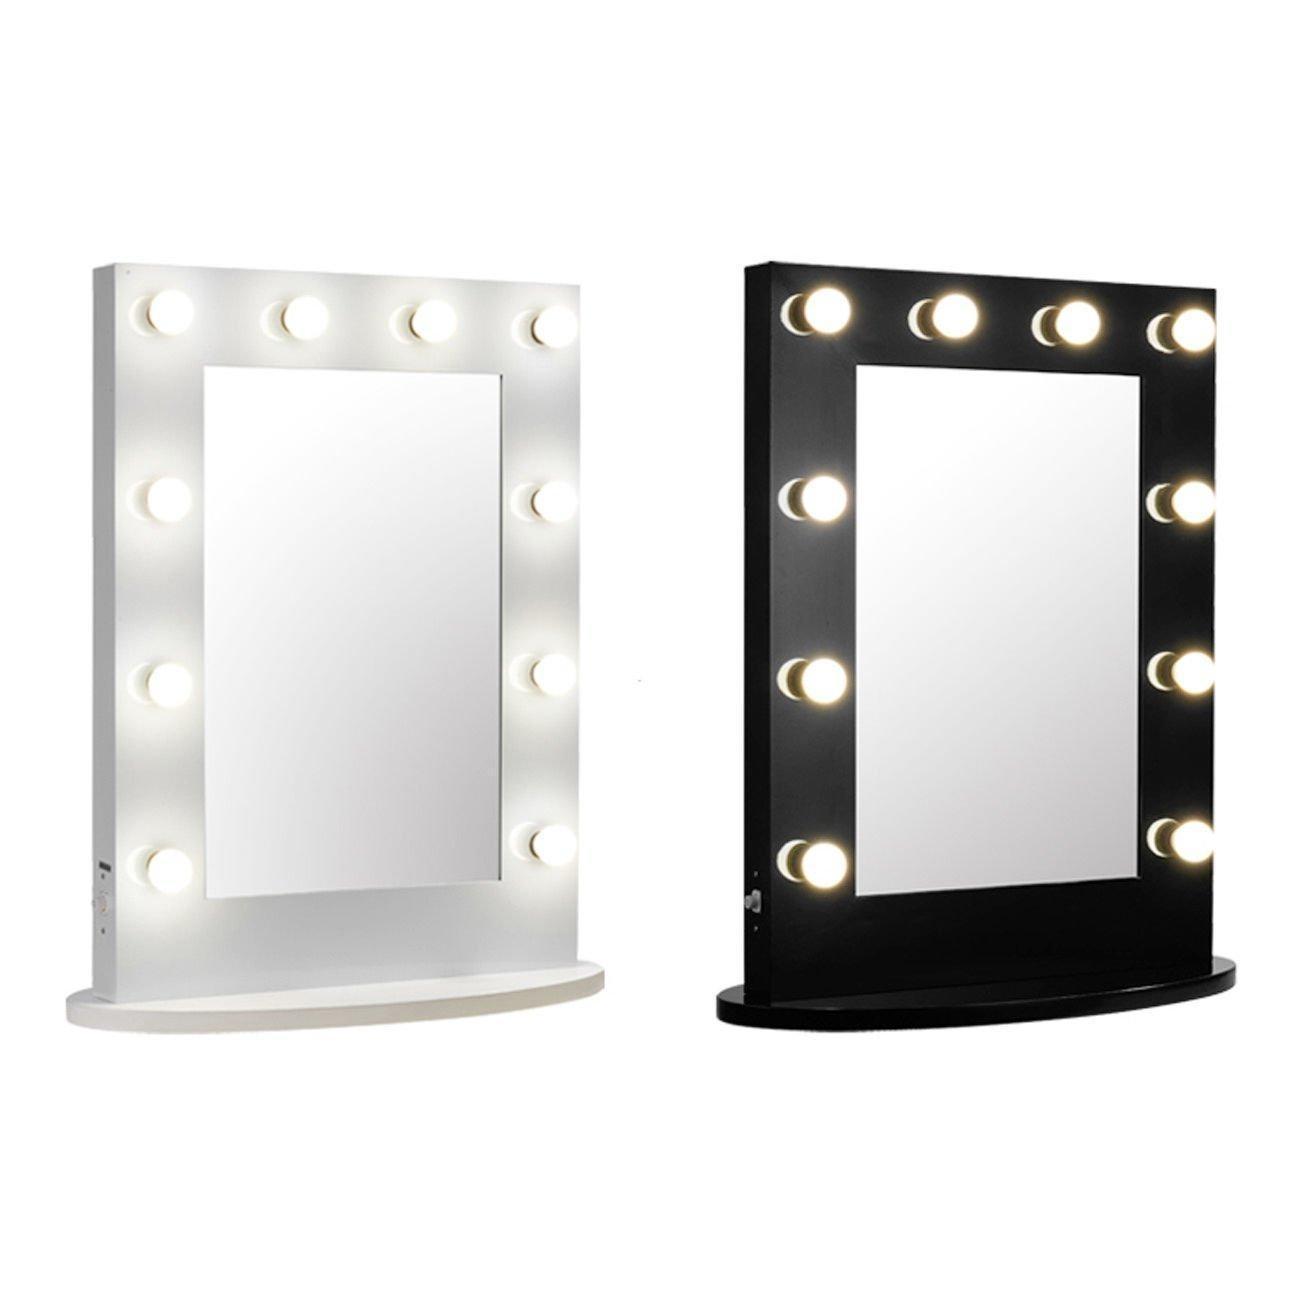 Top 10 Wall Lighted Makeup Mirror 2017 | Warisan Lighting In Lit Makeup Mirrors (View 18 of 20)